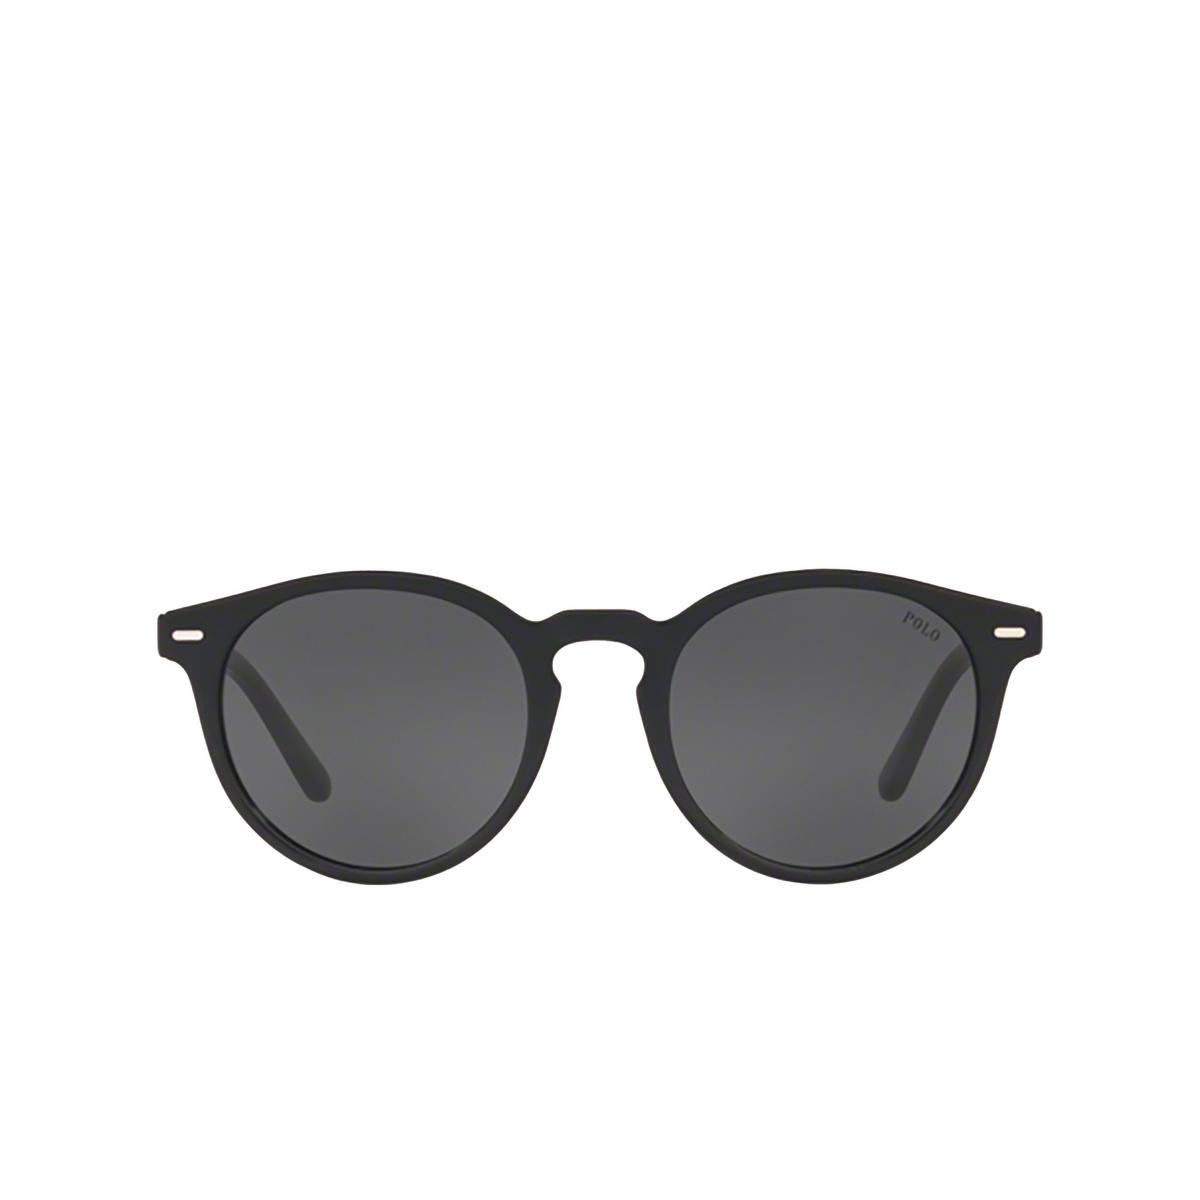 Polo Ralph Lauren® Round Sunglasses: PH4151 color Shiny Black 500187 - front view.